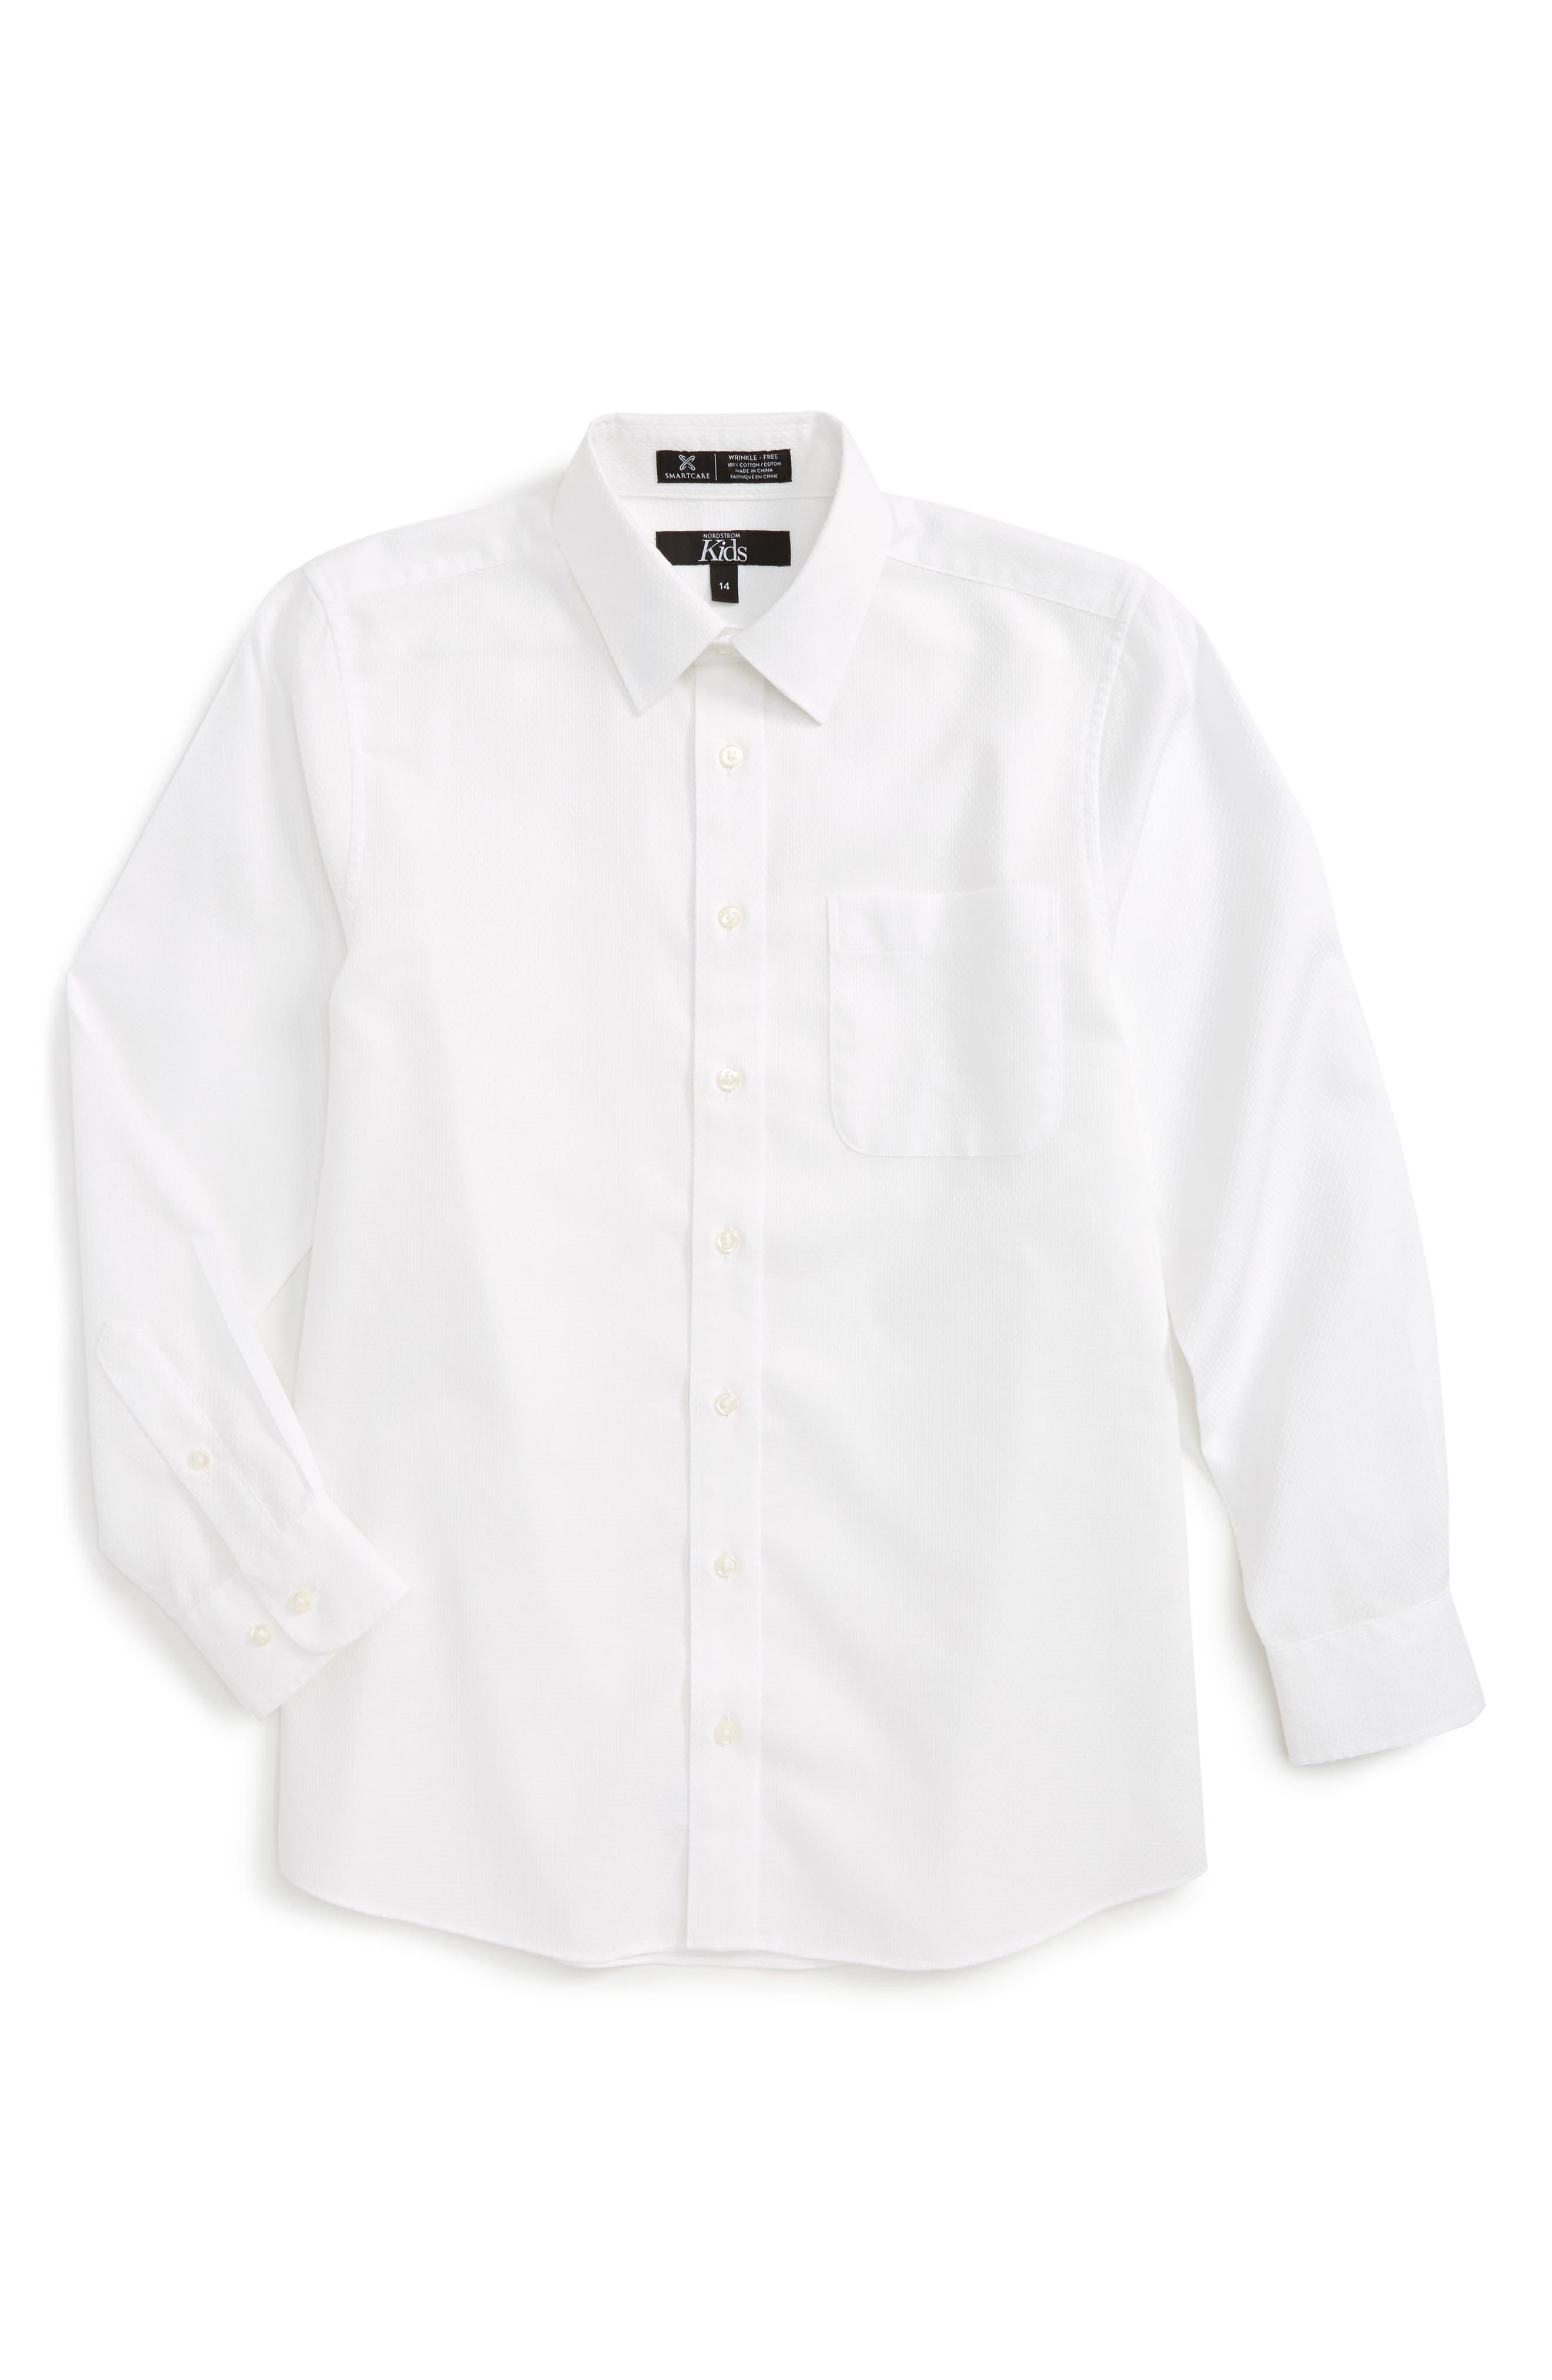 Main Image - Nordstrom Smartcare™ Honeycomb Dress Shirt (Big Boys)